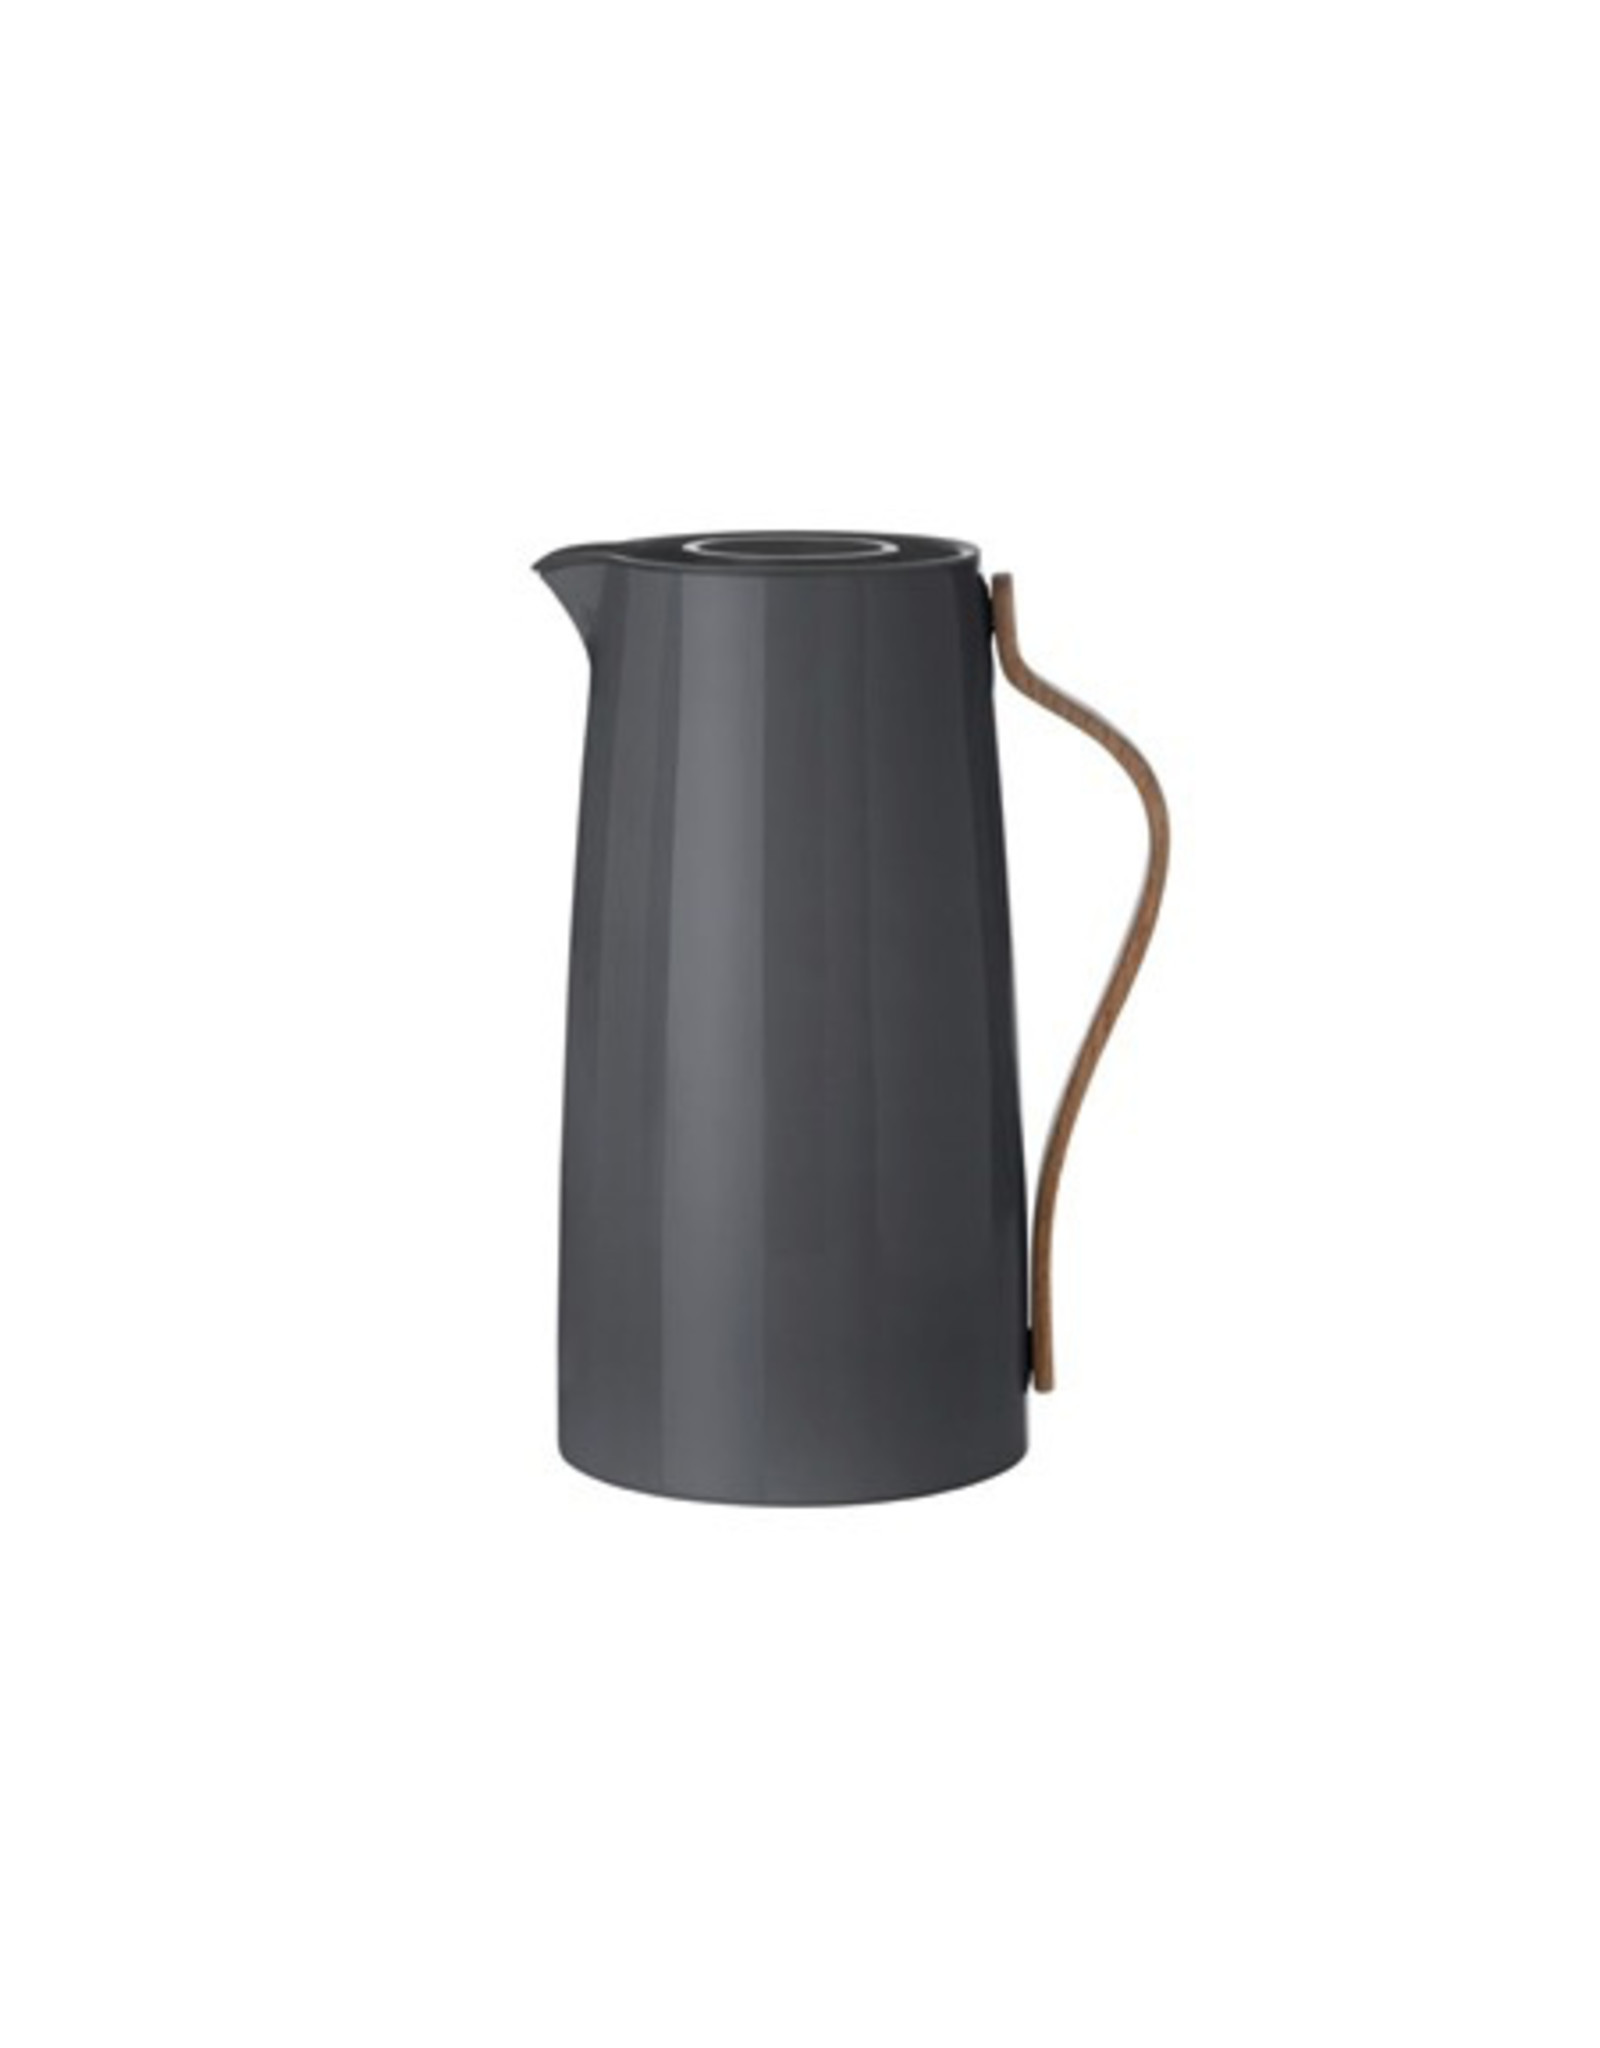 Stelton STELTON EMMA VAVUUM JUG COFFEE 1.2L GREY